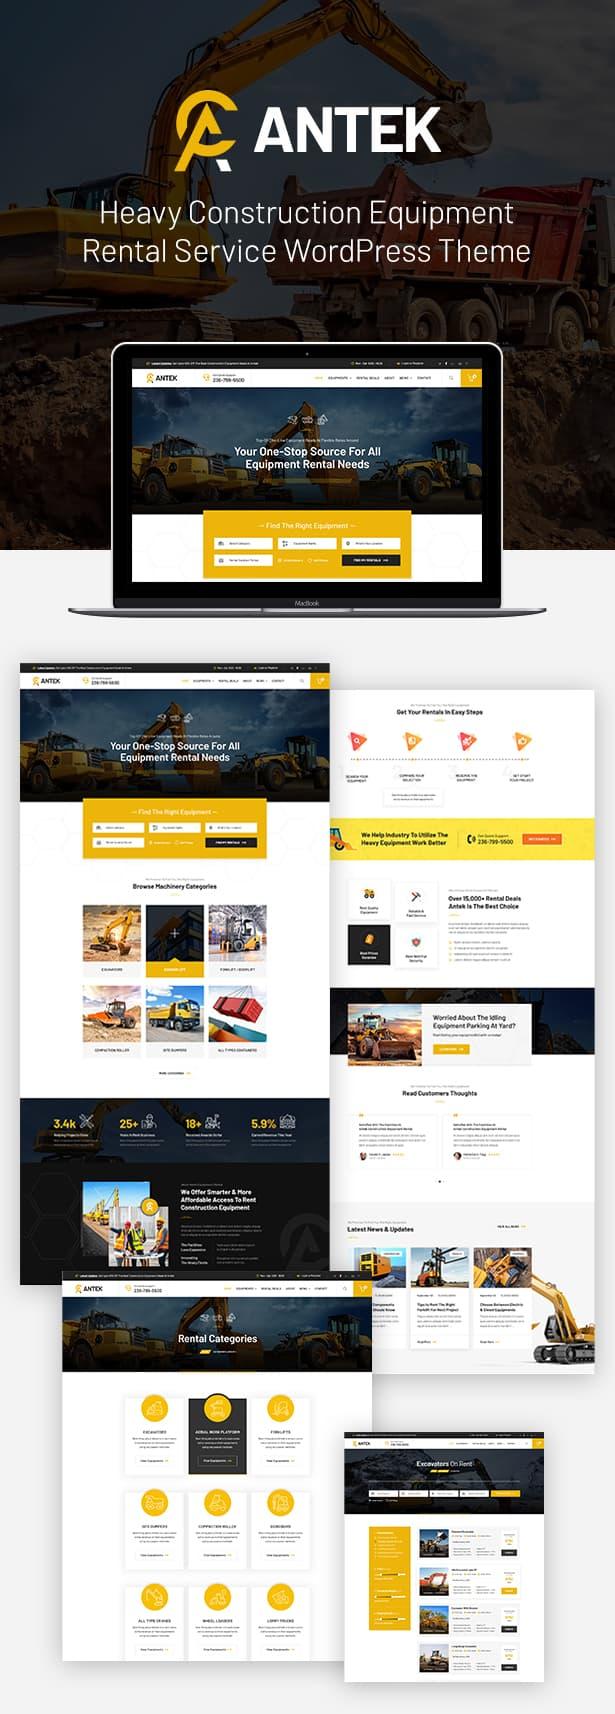 Antek - Construction And Heavy Equipment Rentals WordPress Theme